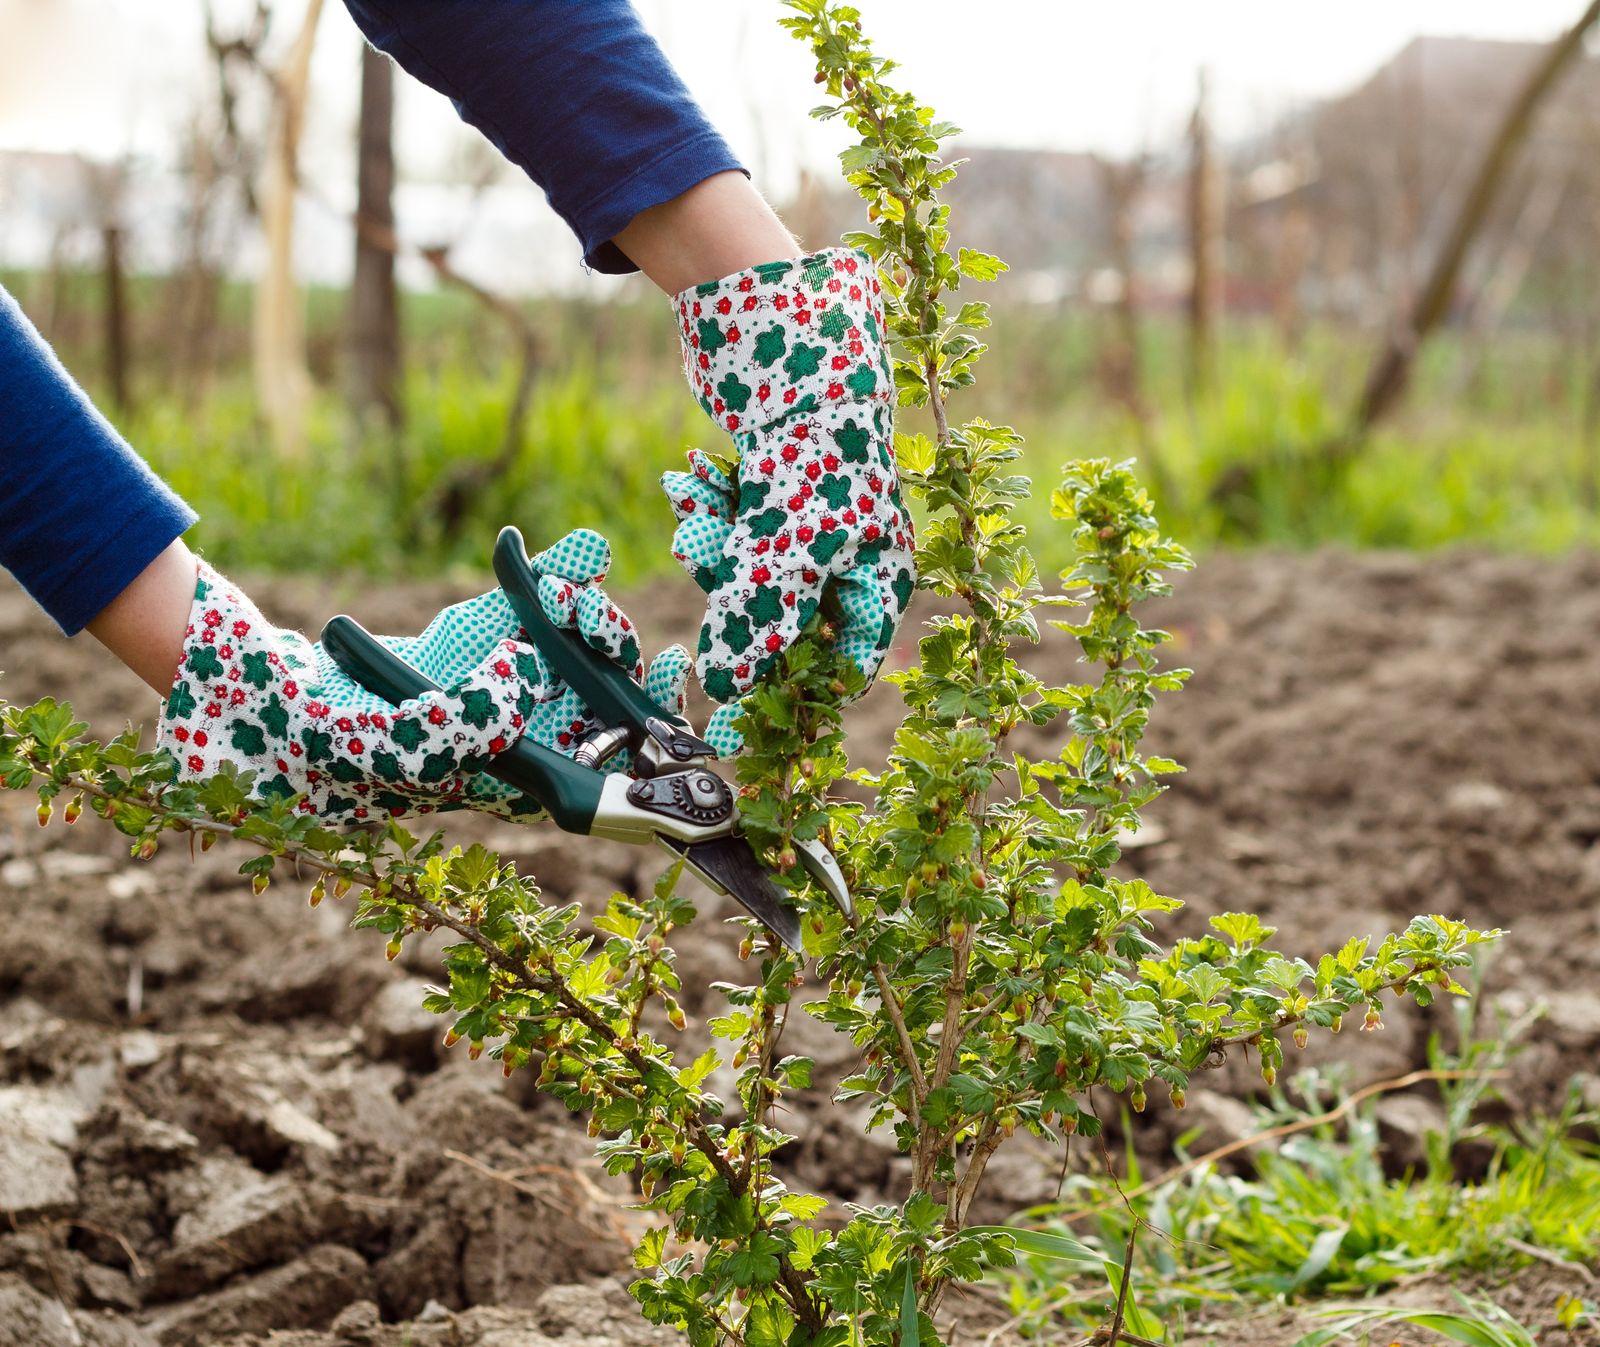 Fabelhaft Stachelbeeren schneiden: Profi-Tipps zum Beschneiden - Plantura &BH_12